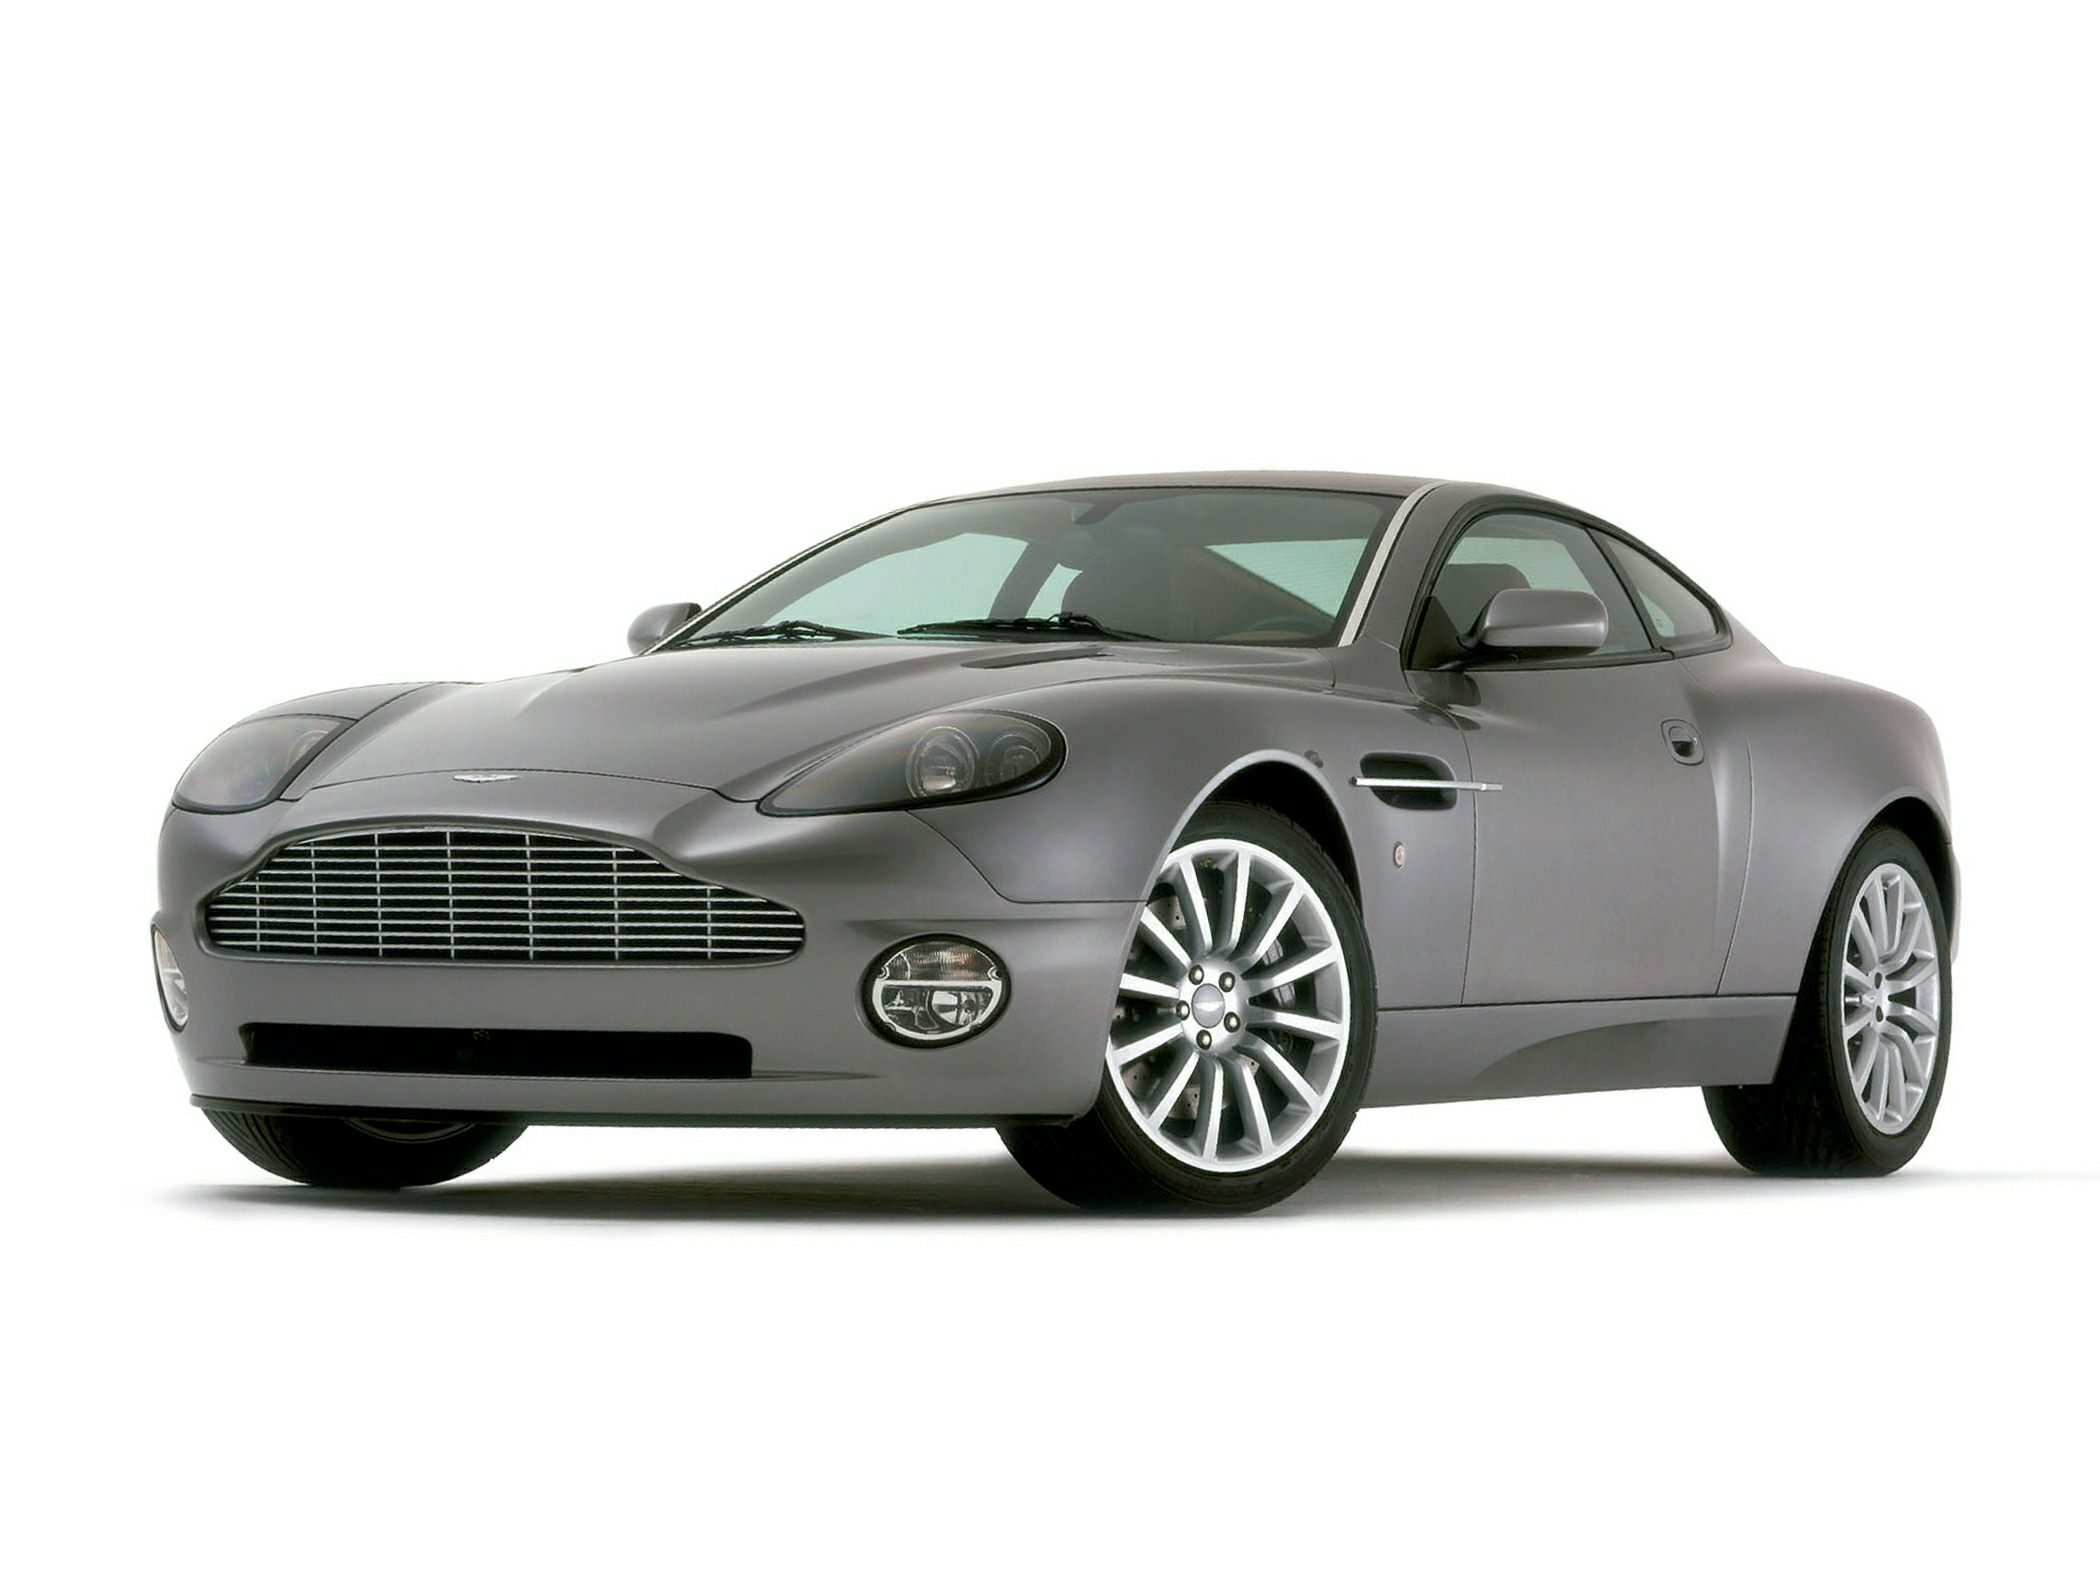 2006 Aston Martin Vanquish Exterior Photo